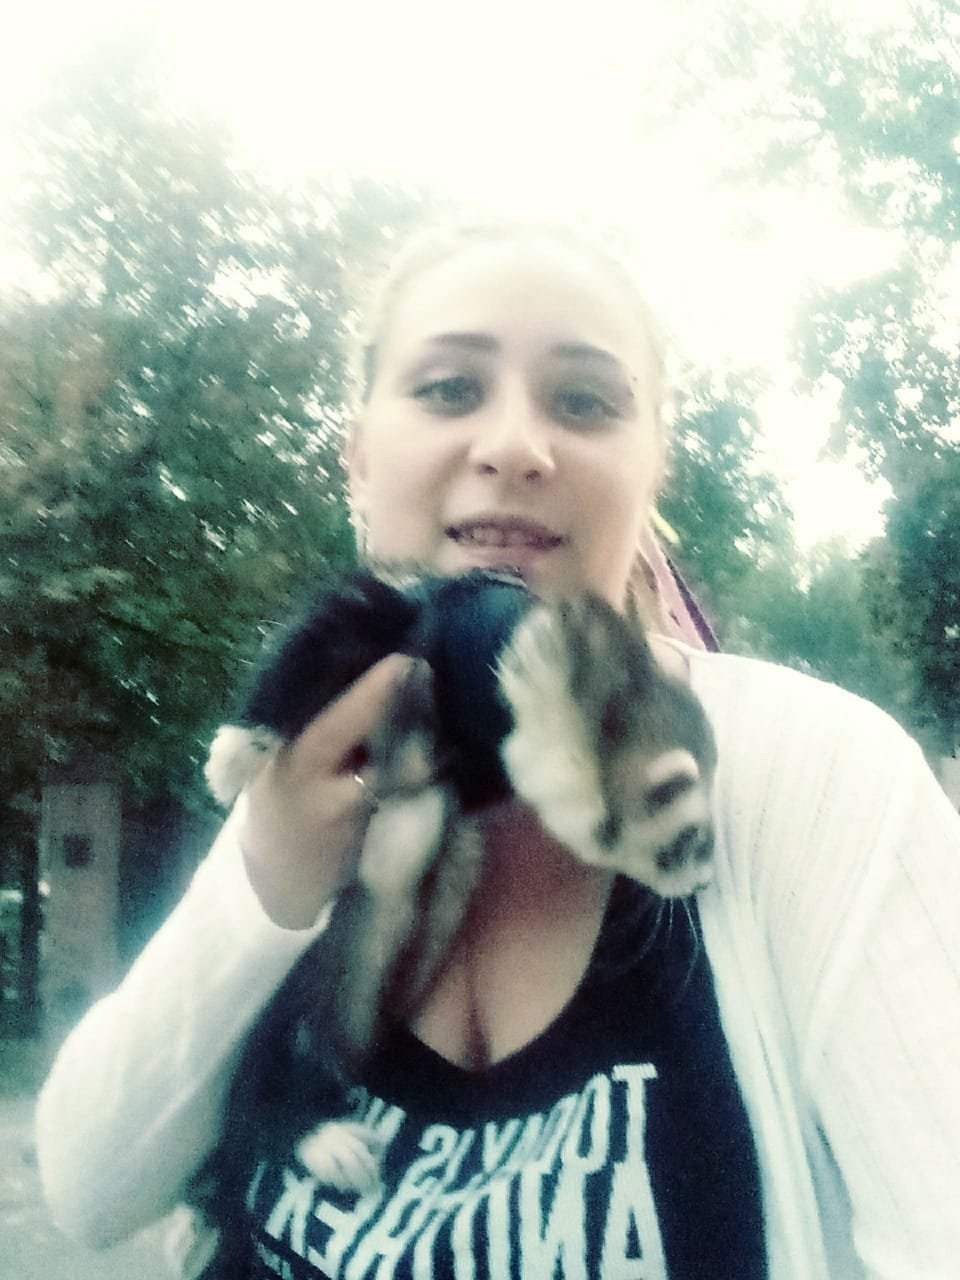 Хорька, которого засняли на видео в Алматы, вернули хозяева (фото, видео), фото-3